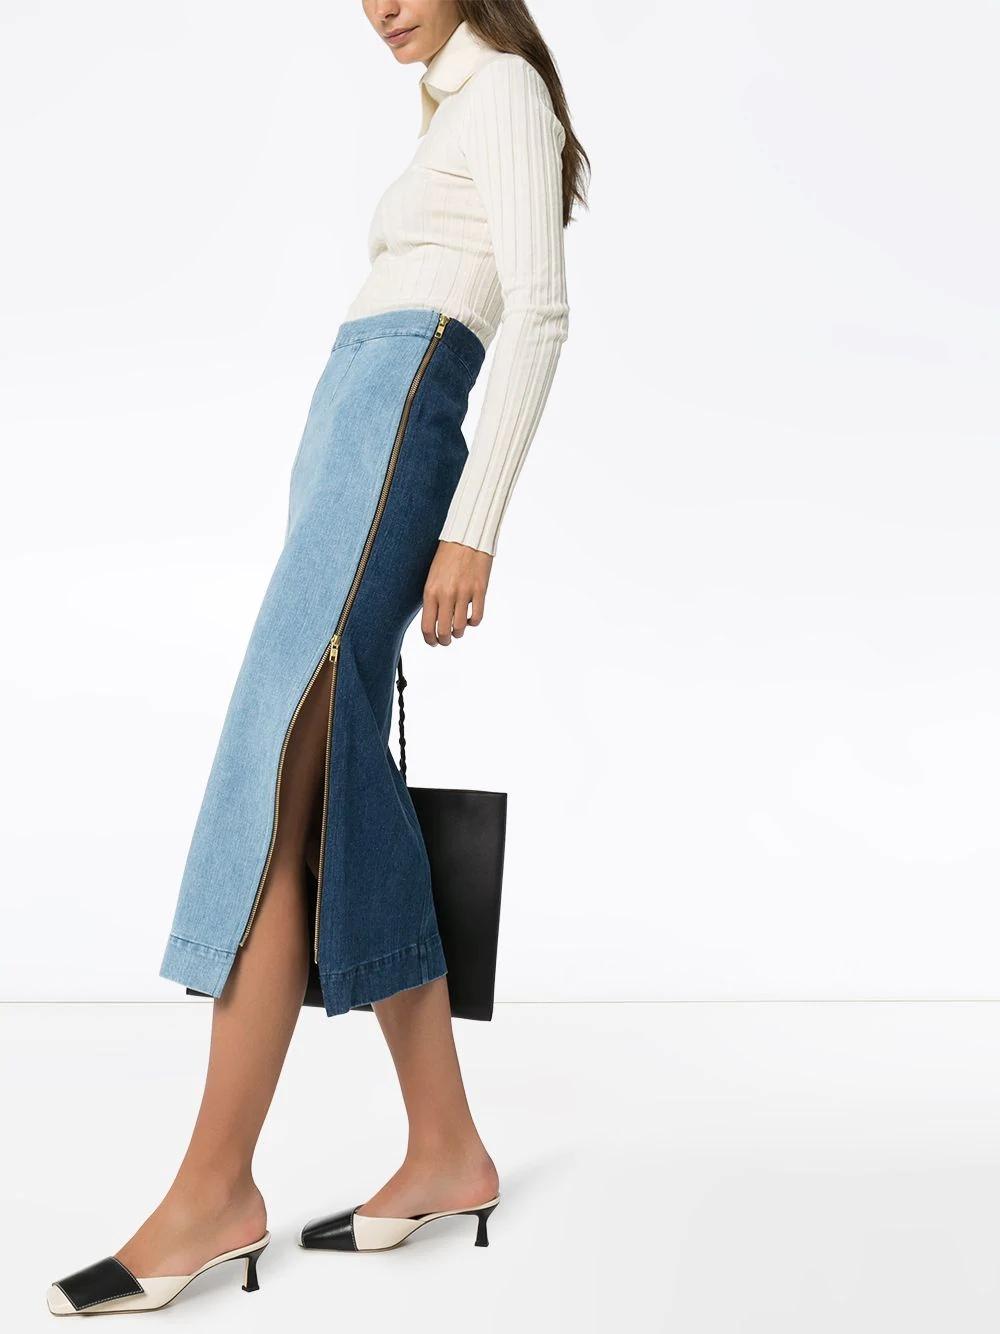 MARA HOFFMAN джинсовая юбка-карандаш Uma